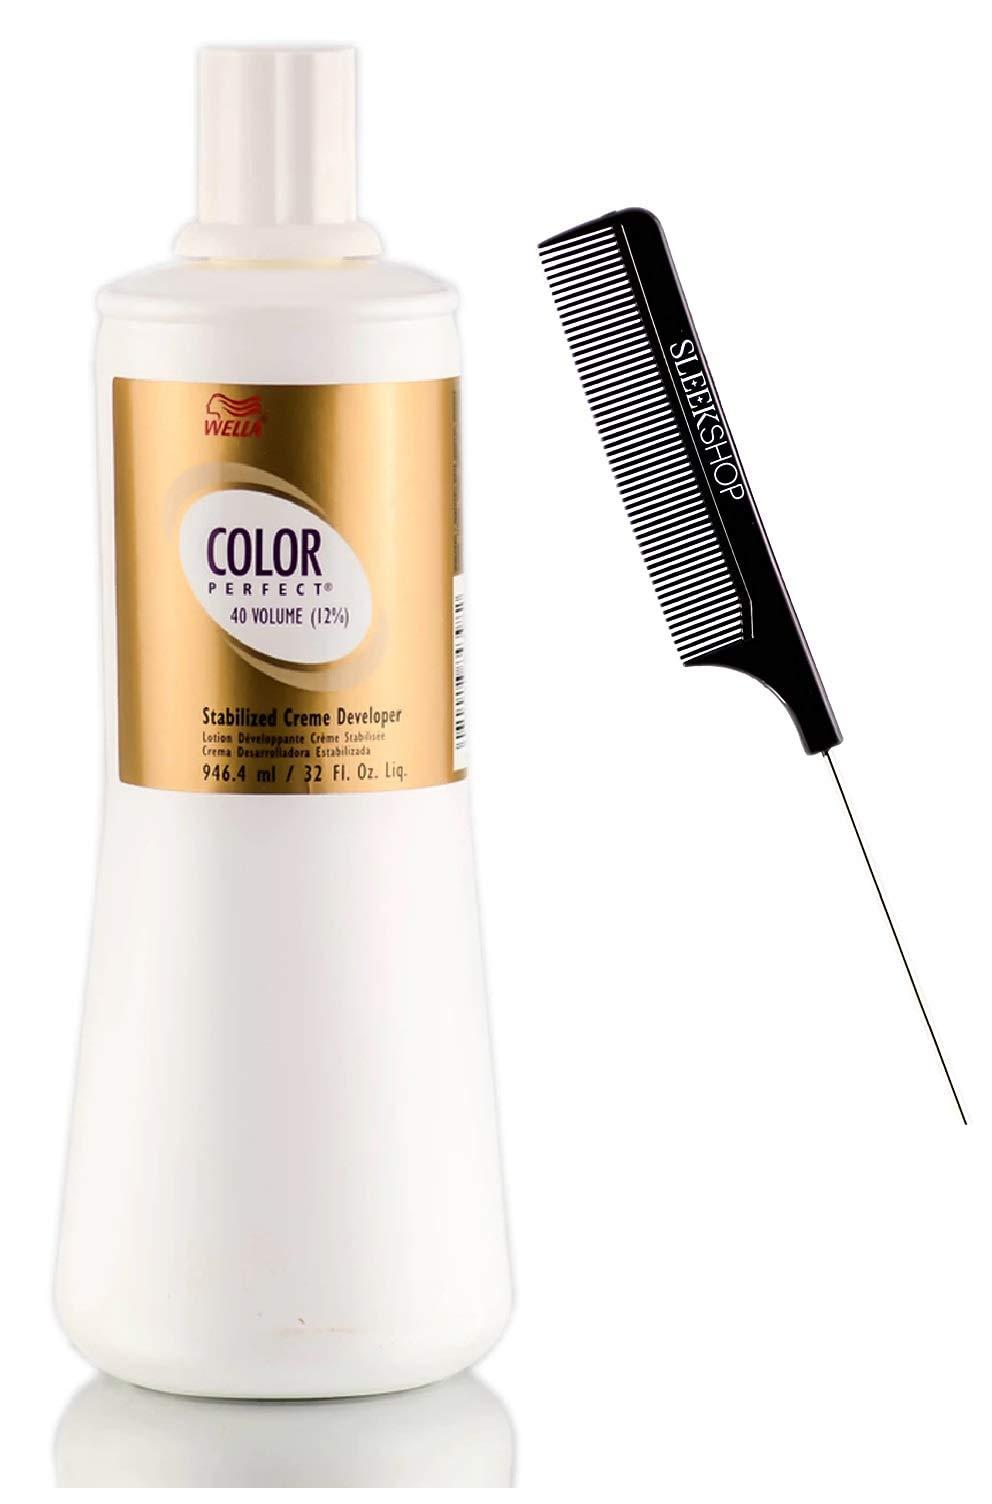 Color Perfect Stabilized Developer Activator for Permanent Creme Gel Haircolor Dye (w/Sleek Tint Brush) Hydrogen Peroxide Cream-Gel Hair Color (CREME - 40 Volume / 12% - 32 oz/liter)